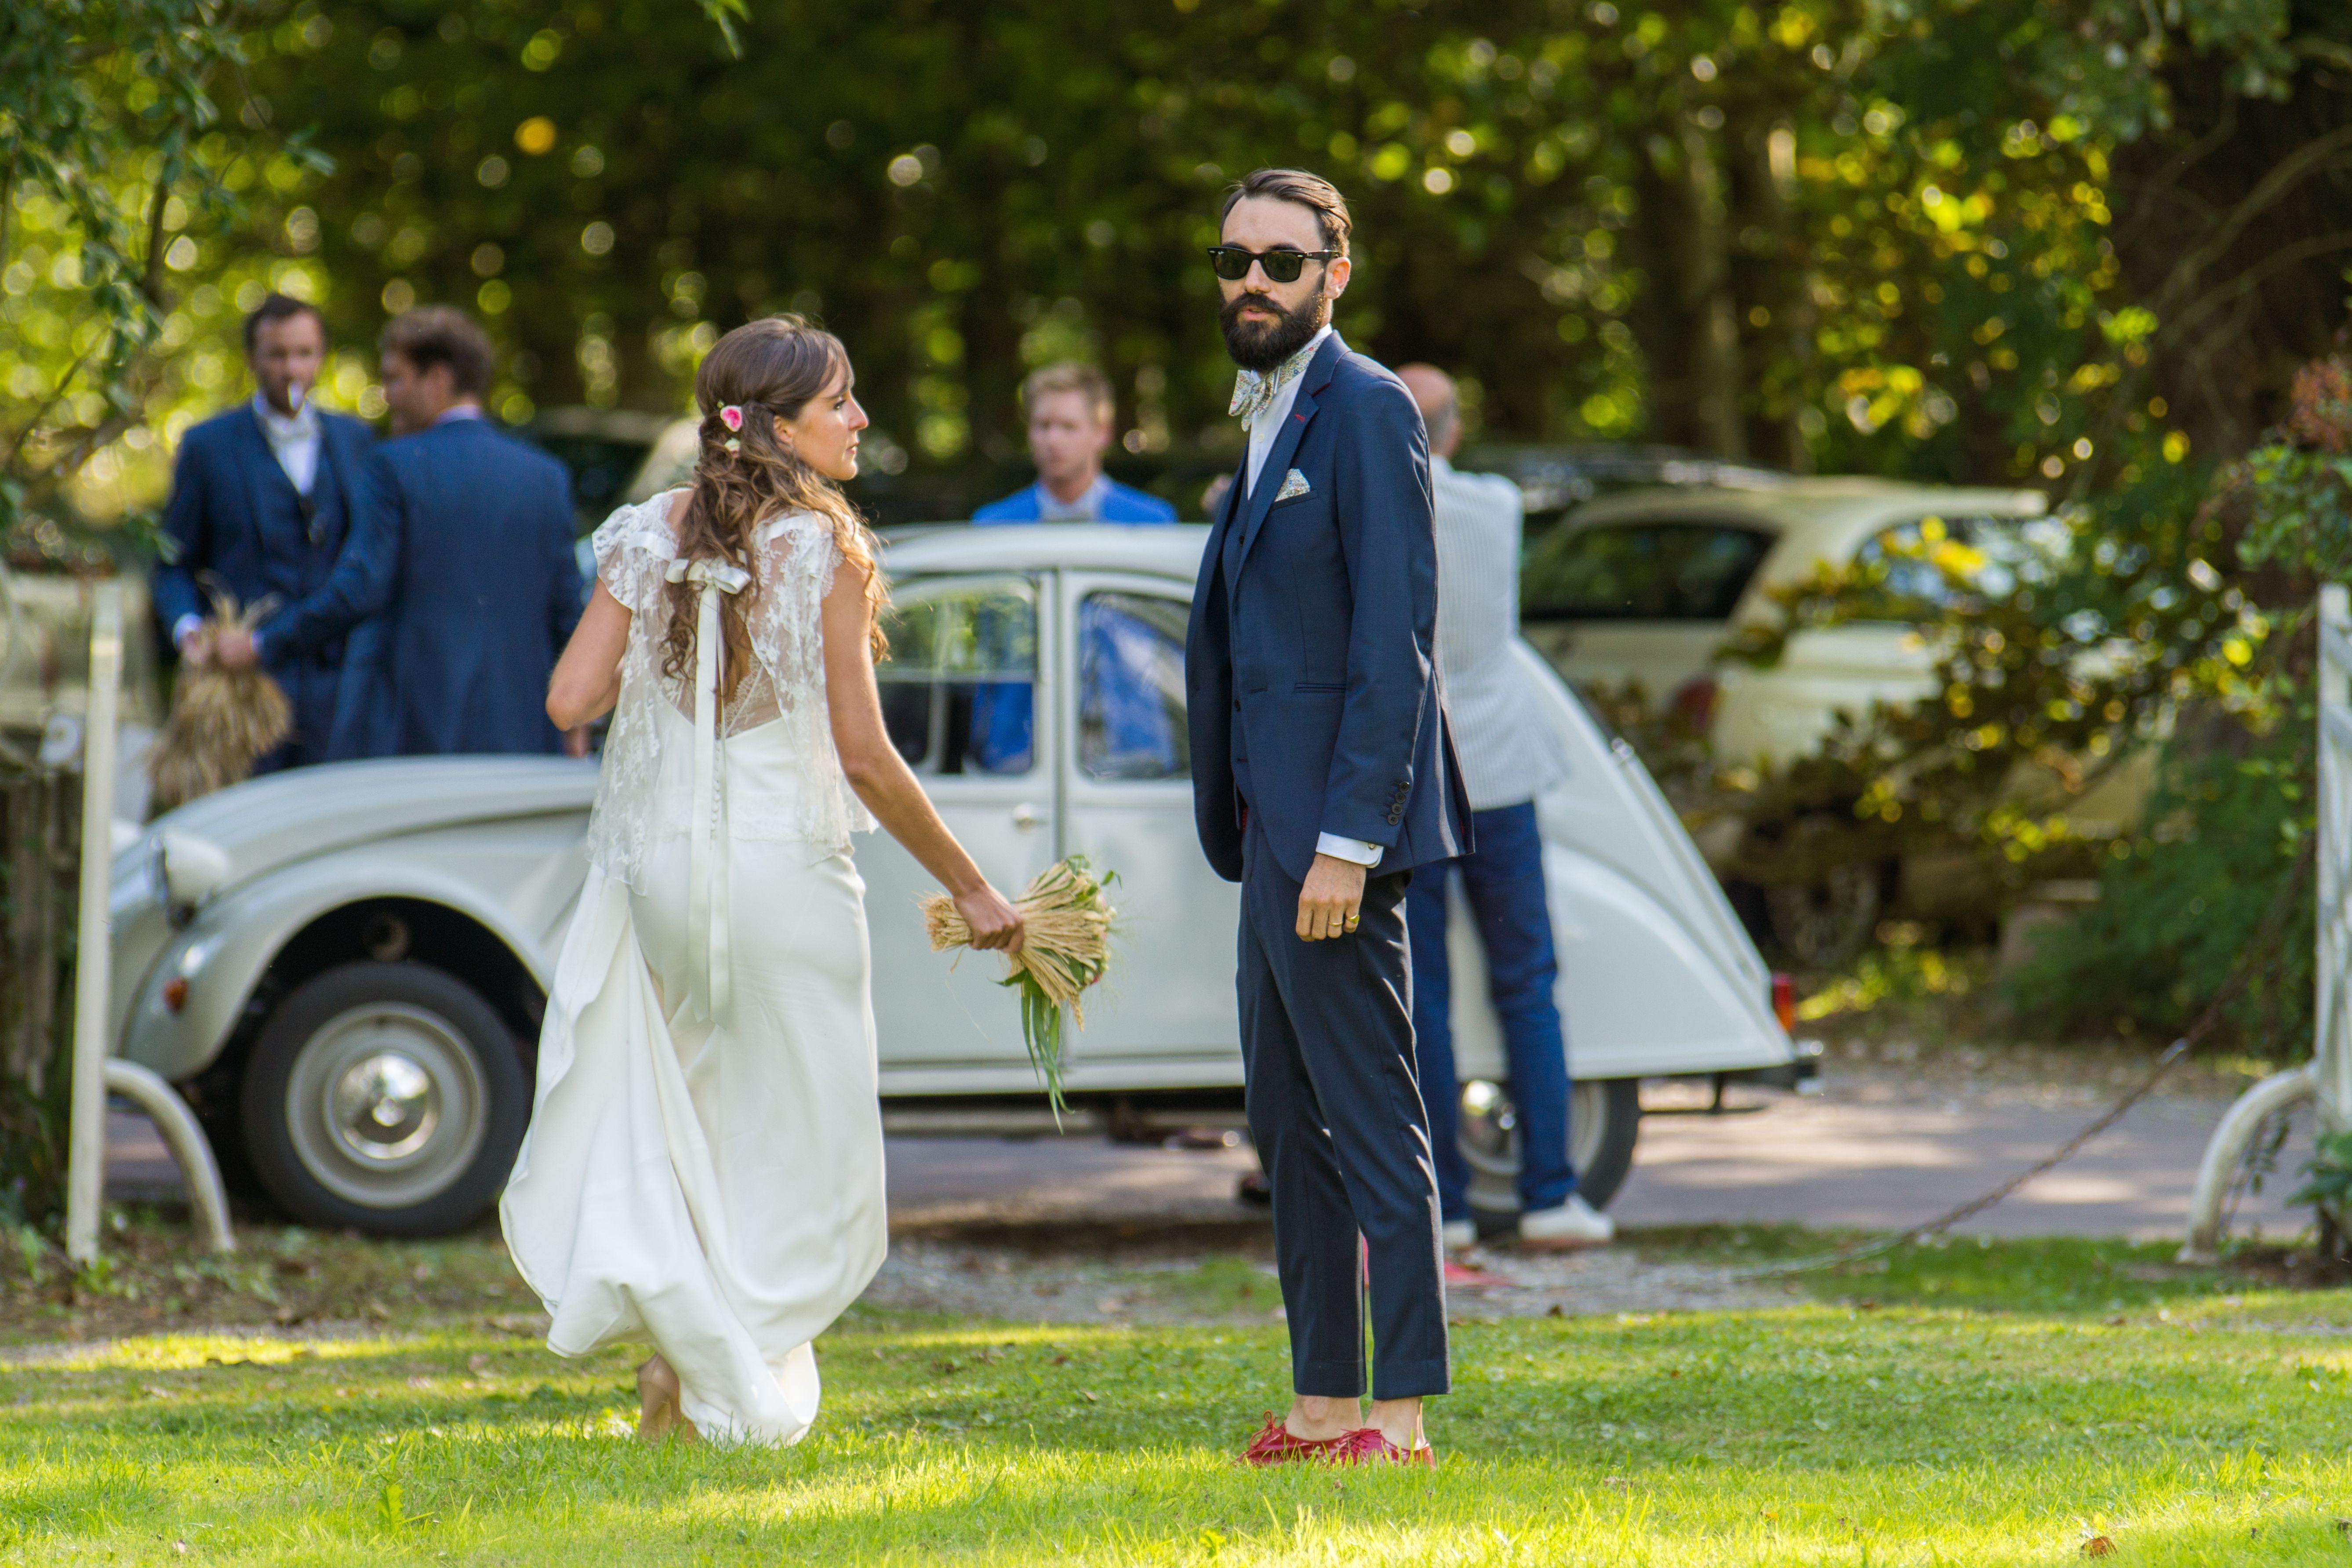 La marié en costume hypster